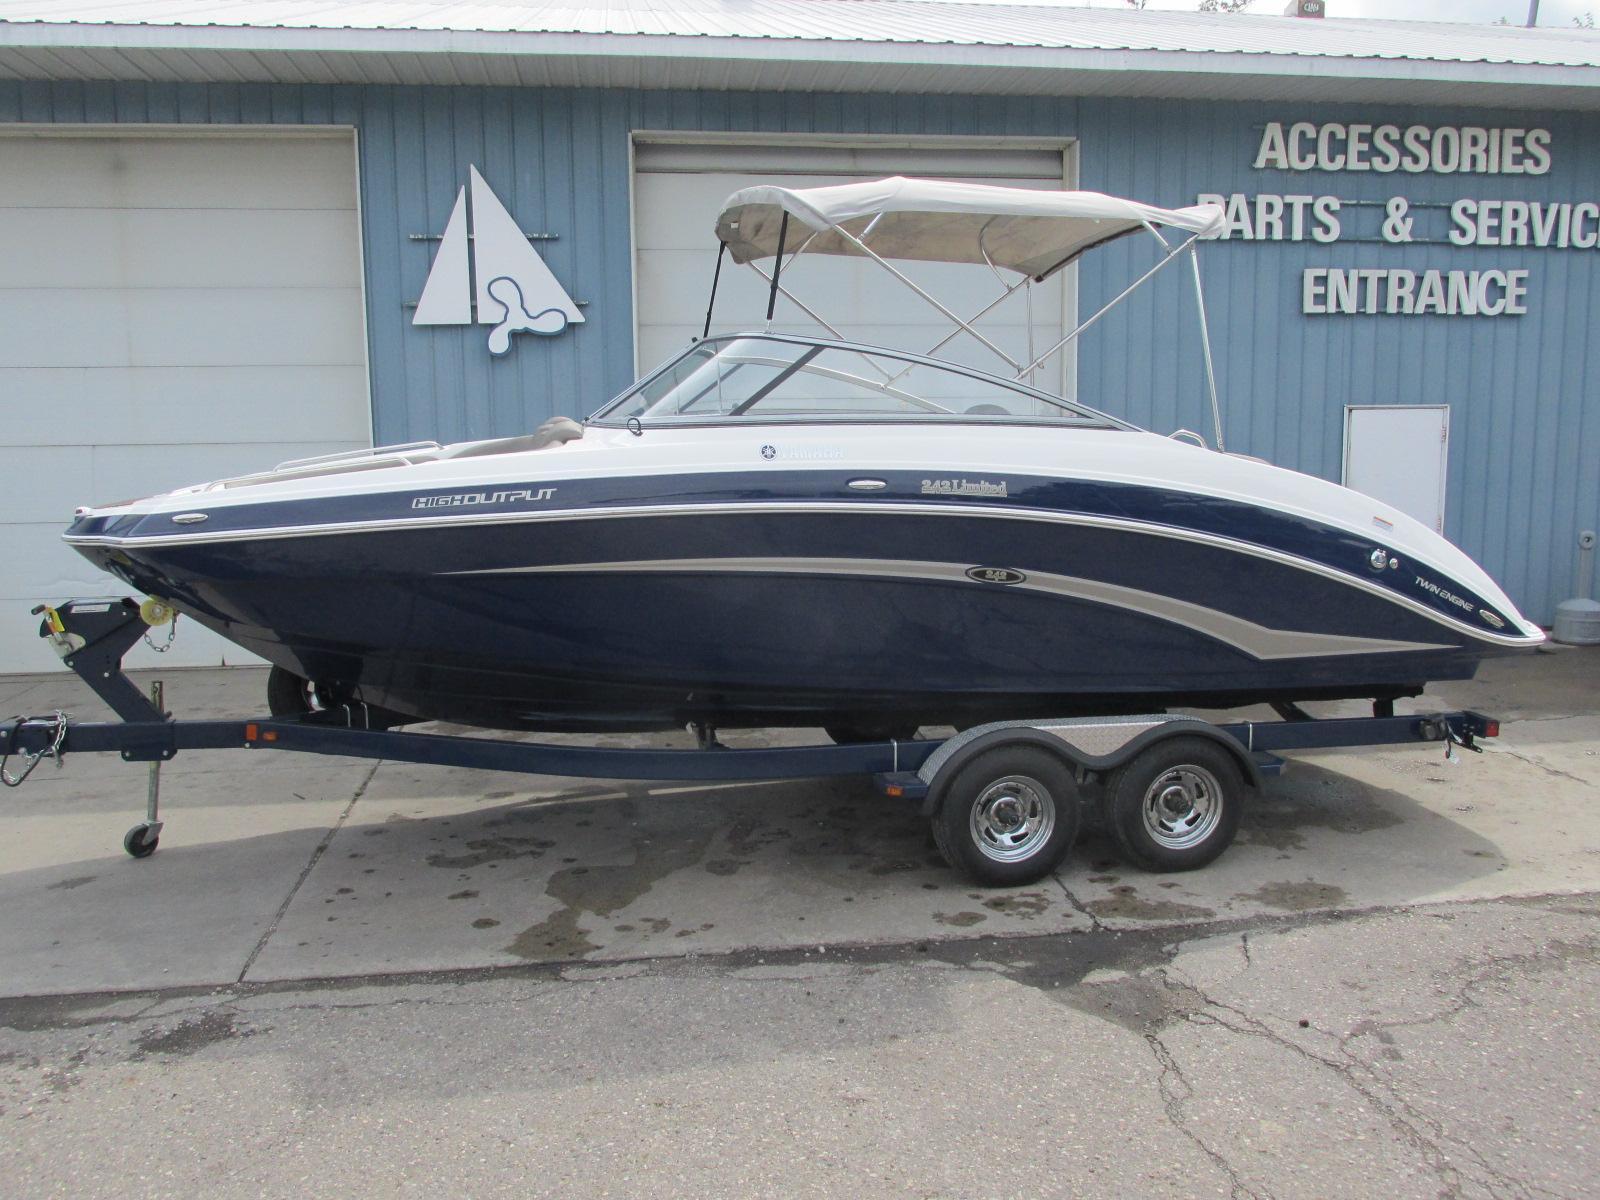 Yamaha Boats242 Limited